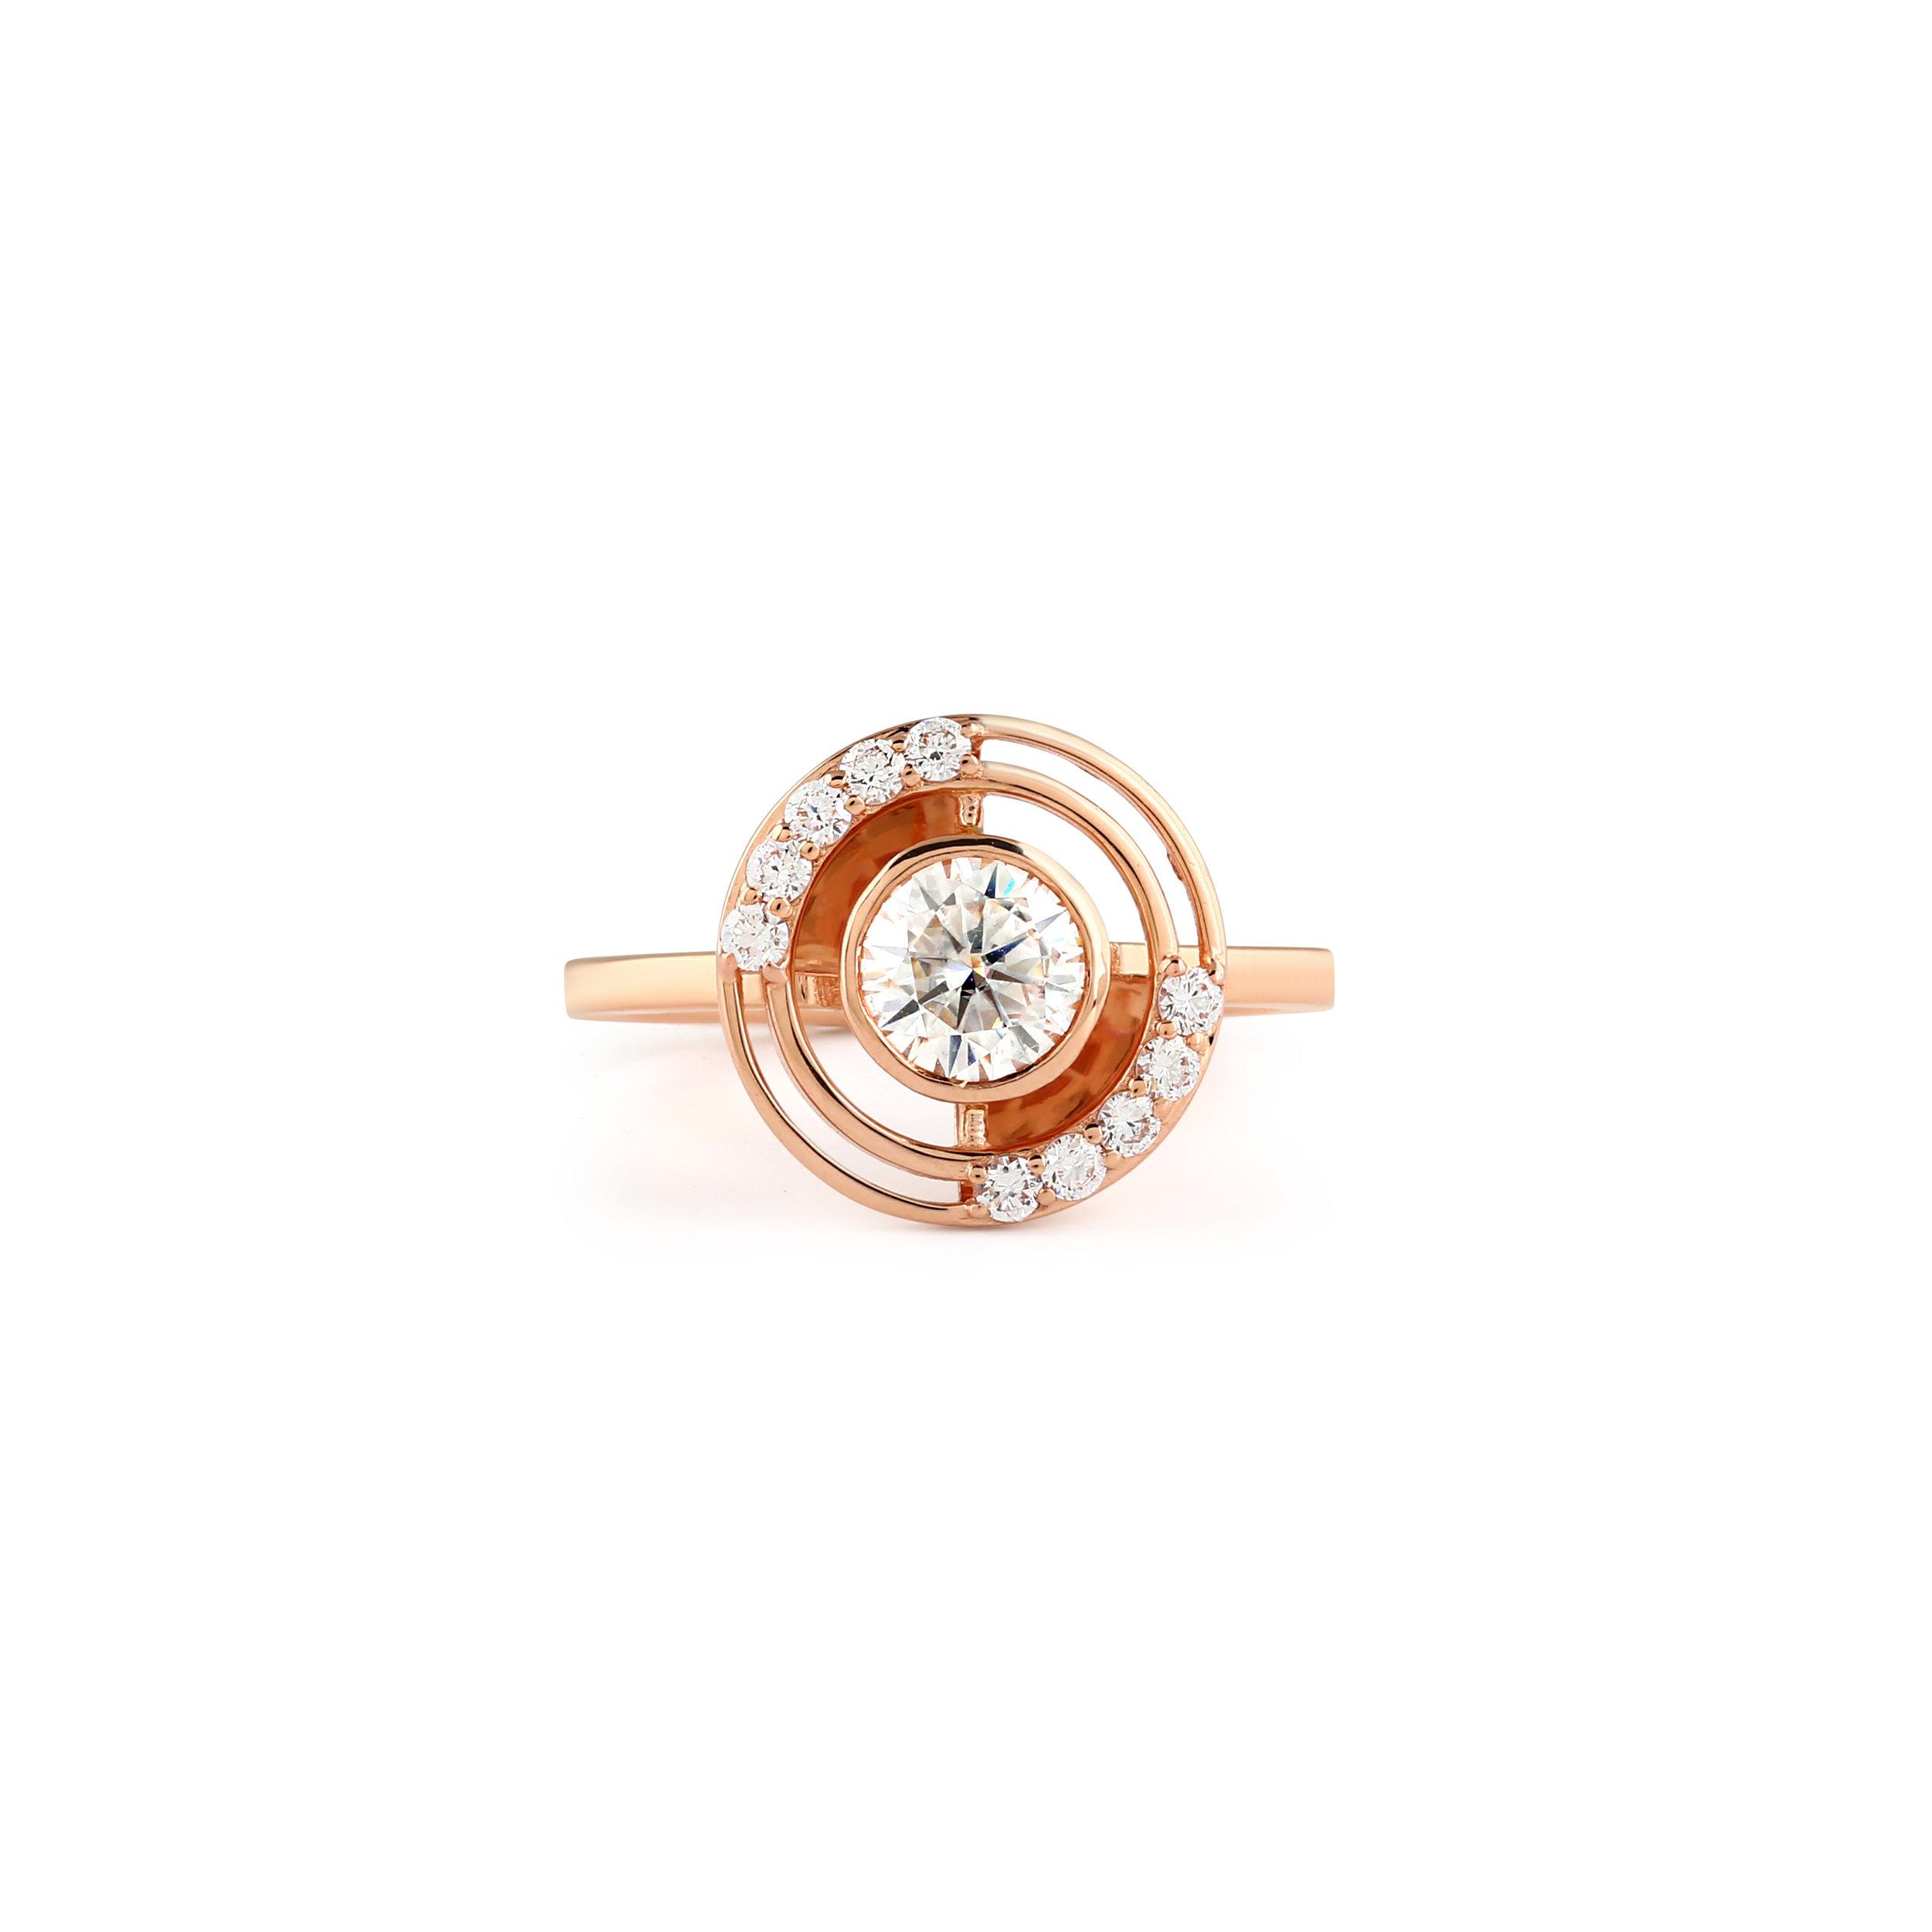 State-Property-Gravity-Ascella-Ring